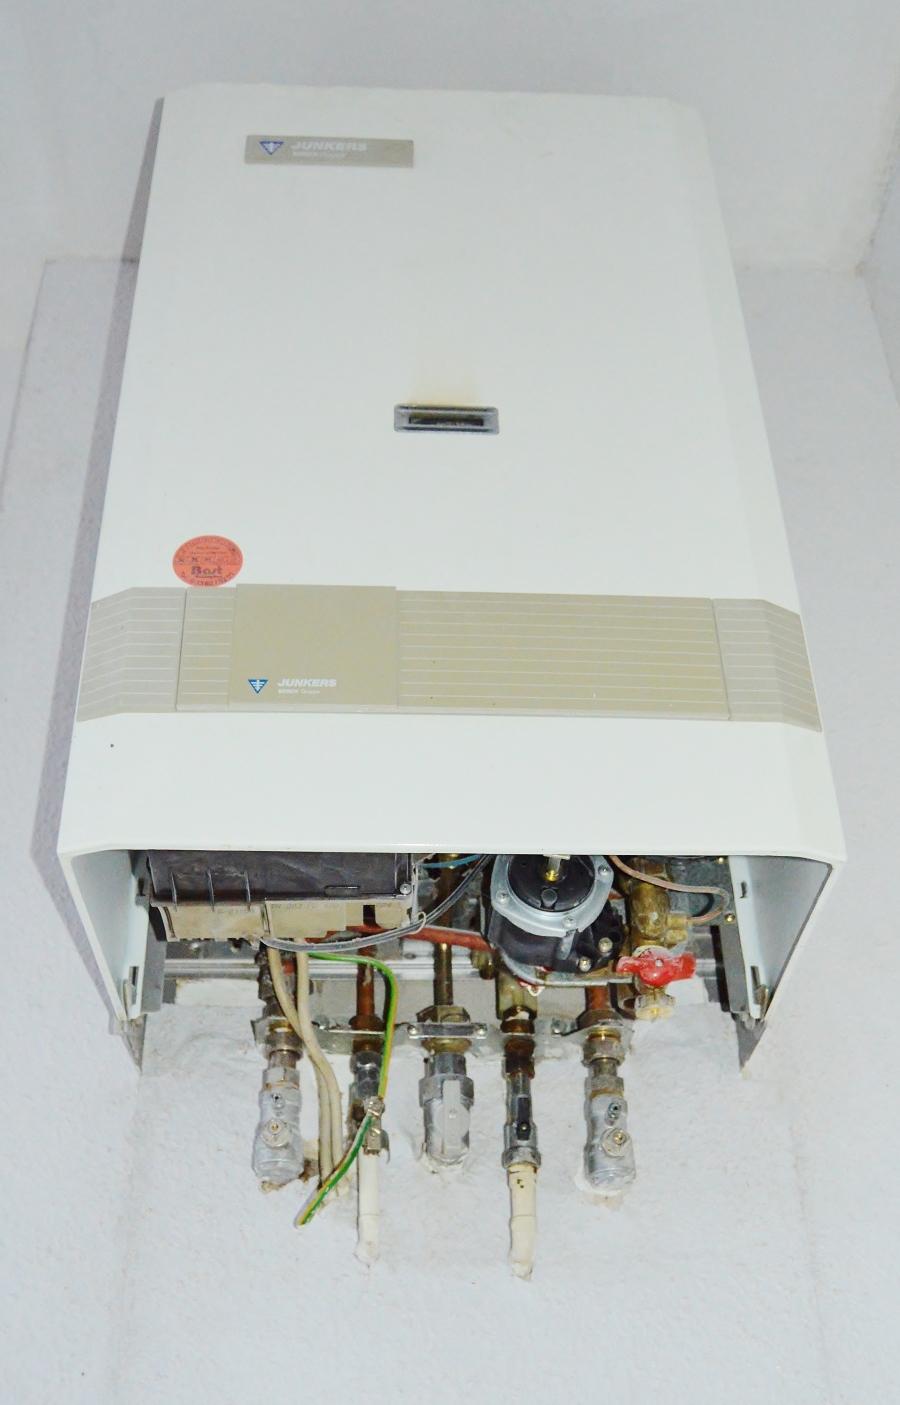 10 most common boiler problems - Kiasu Workforce